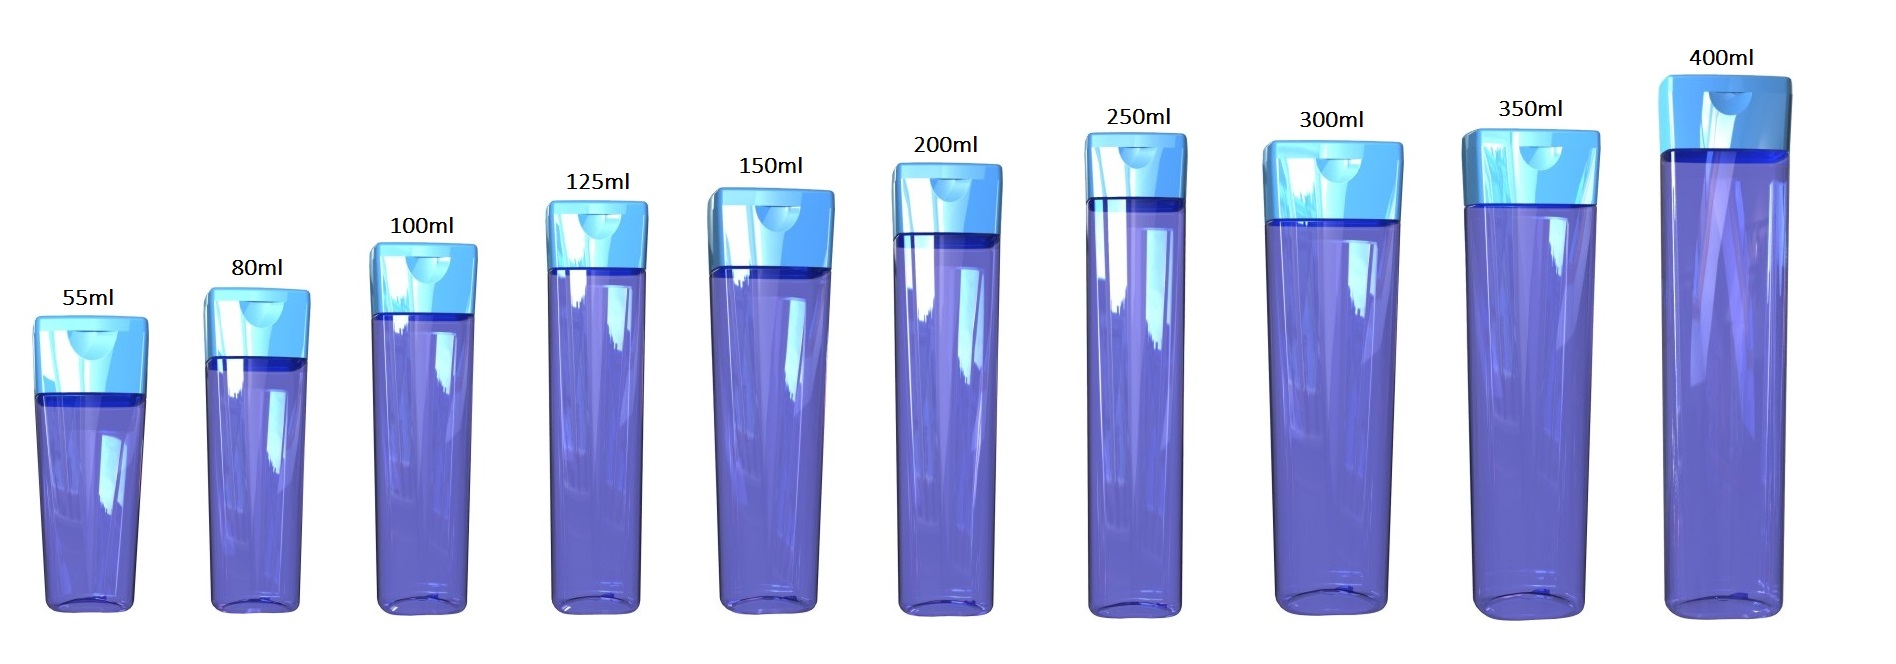 Botella PET FB1547. FB1548, FB1549, FB1550, FB1543, FB1544, FB1545, FB1560, FB1561, FB1562